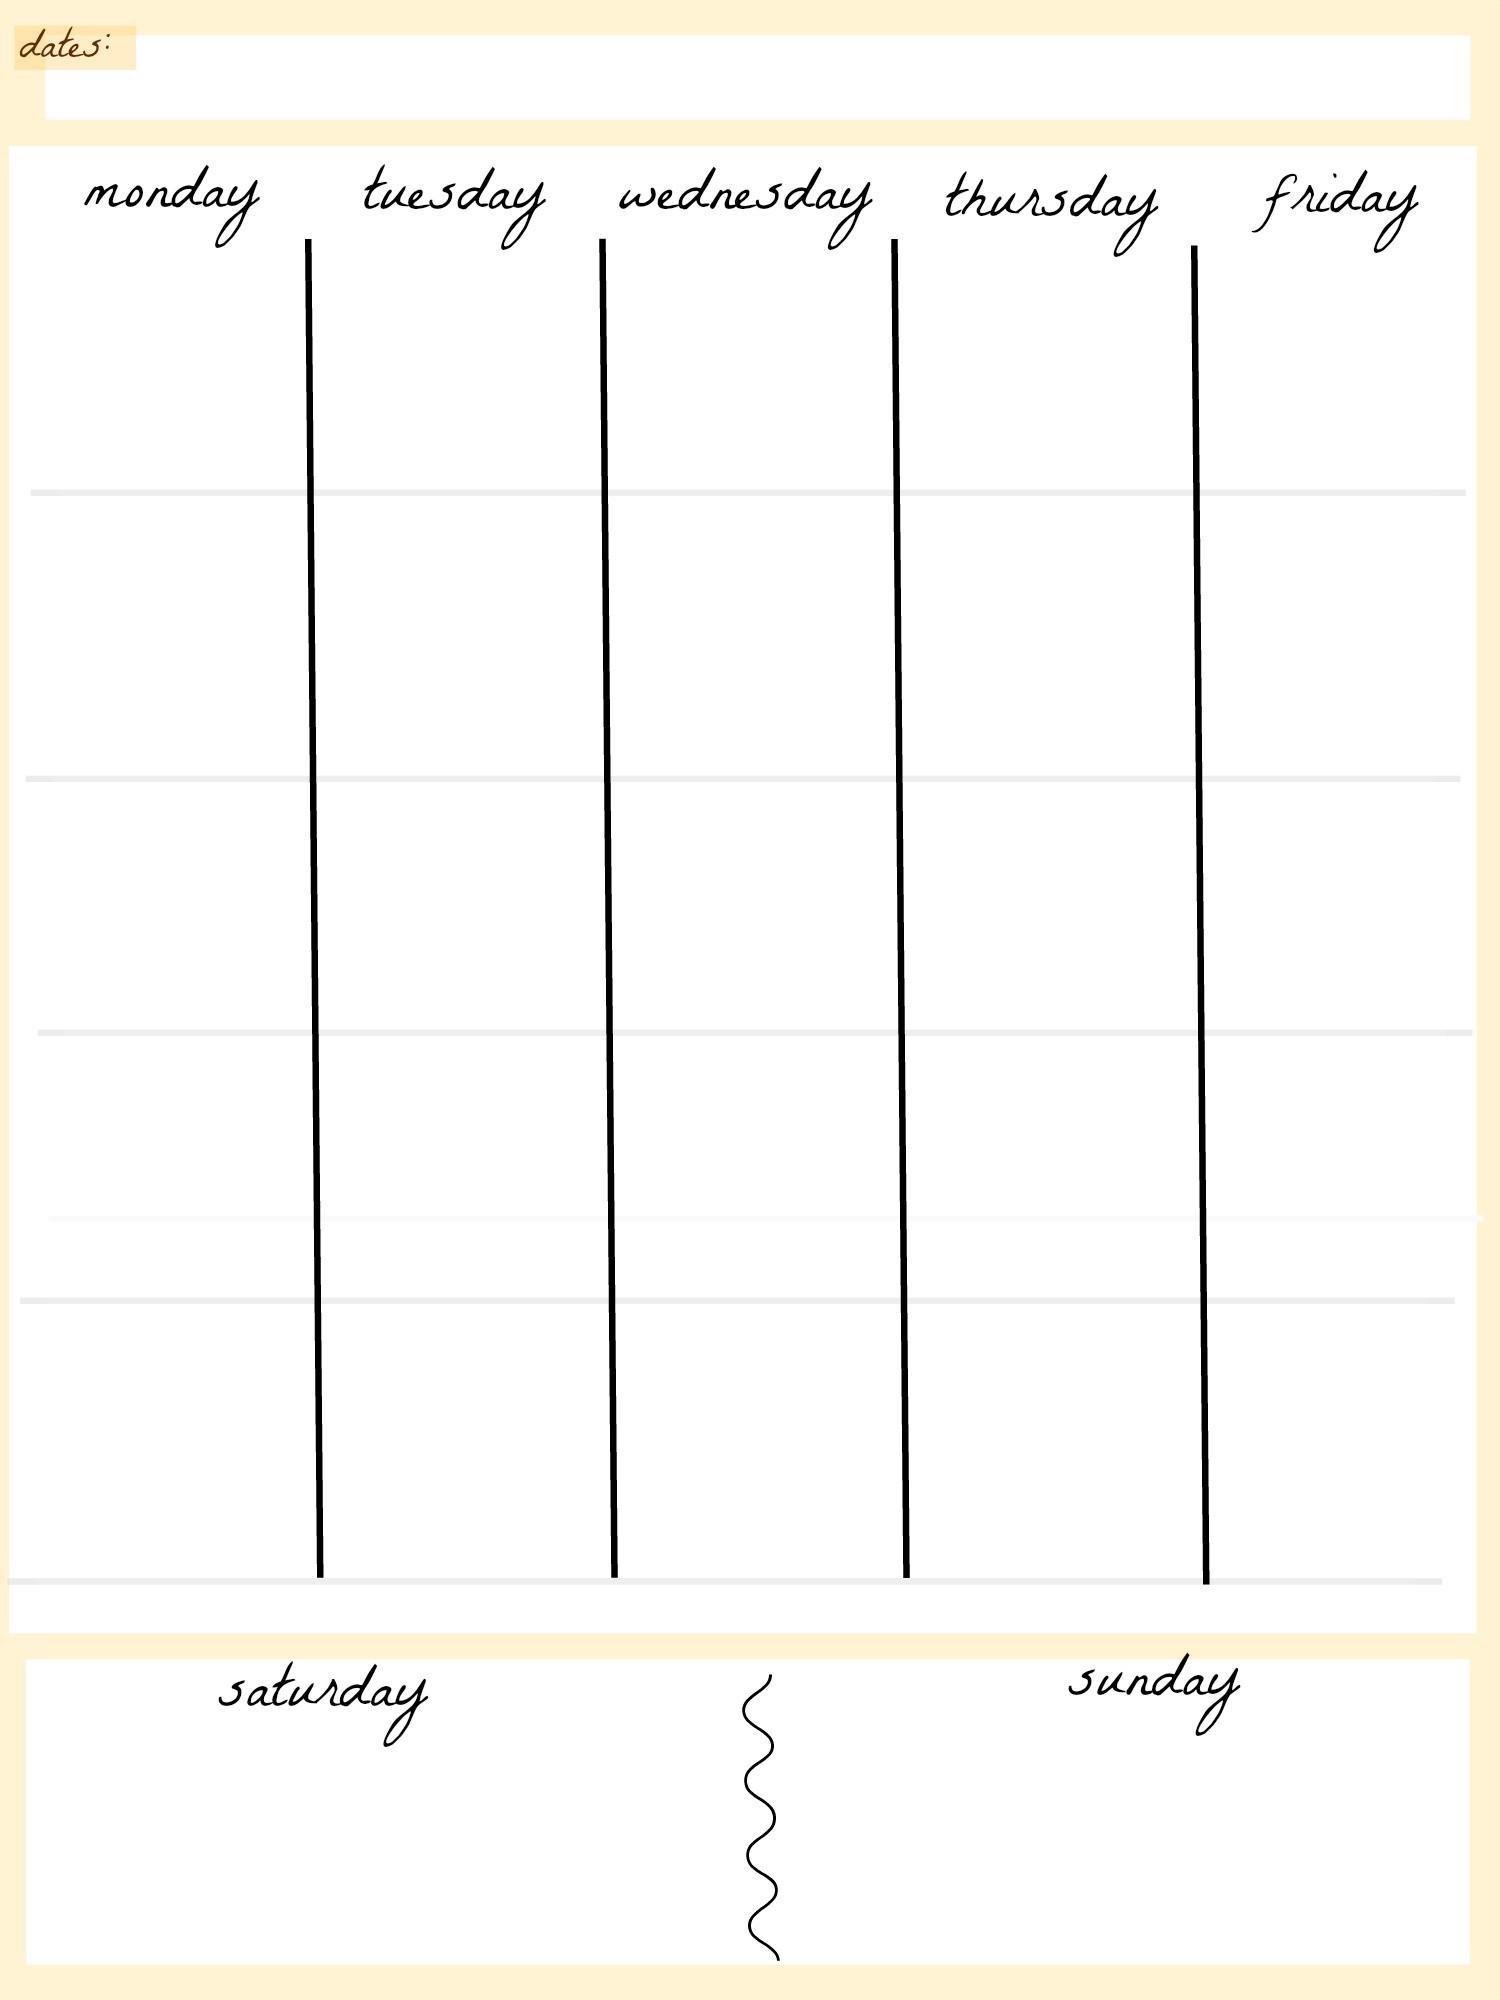 Blank Calendar Template 5 Day Week Weekly Calendar 5 Day Travel Cal1